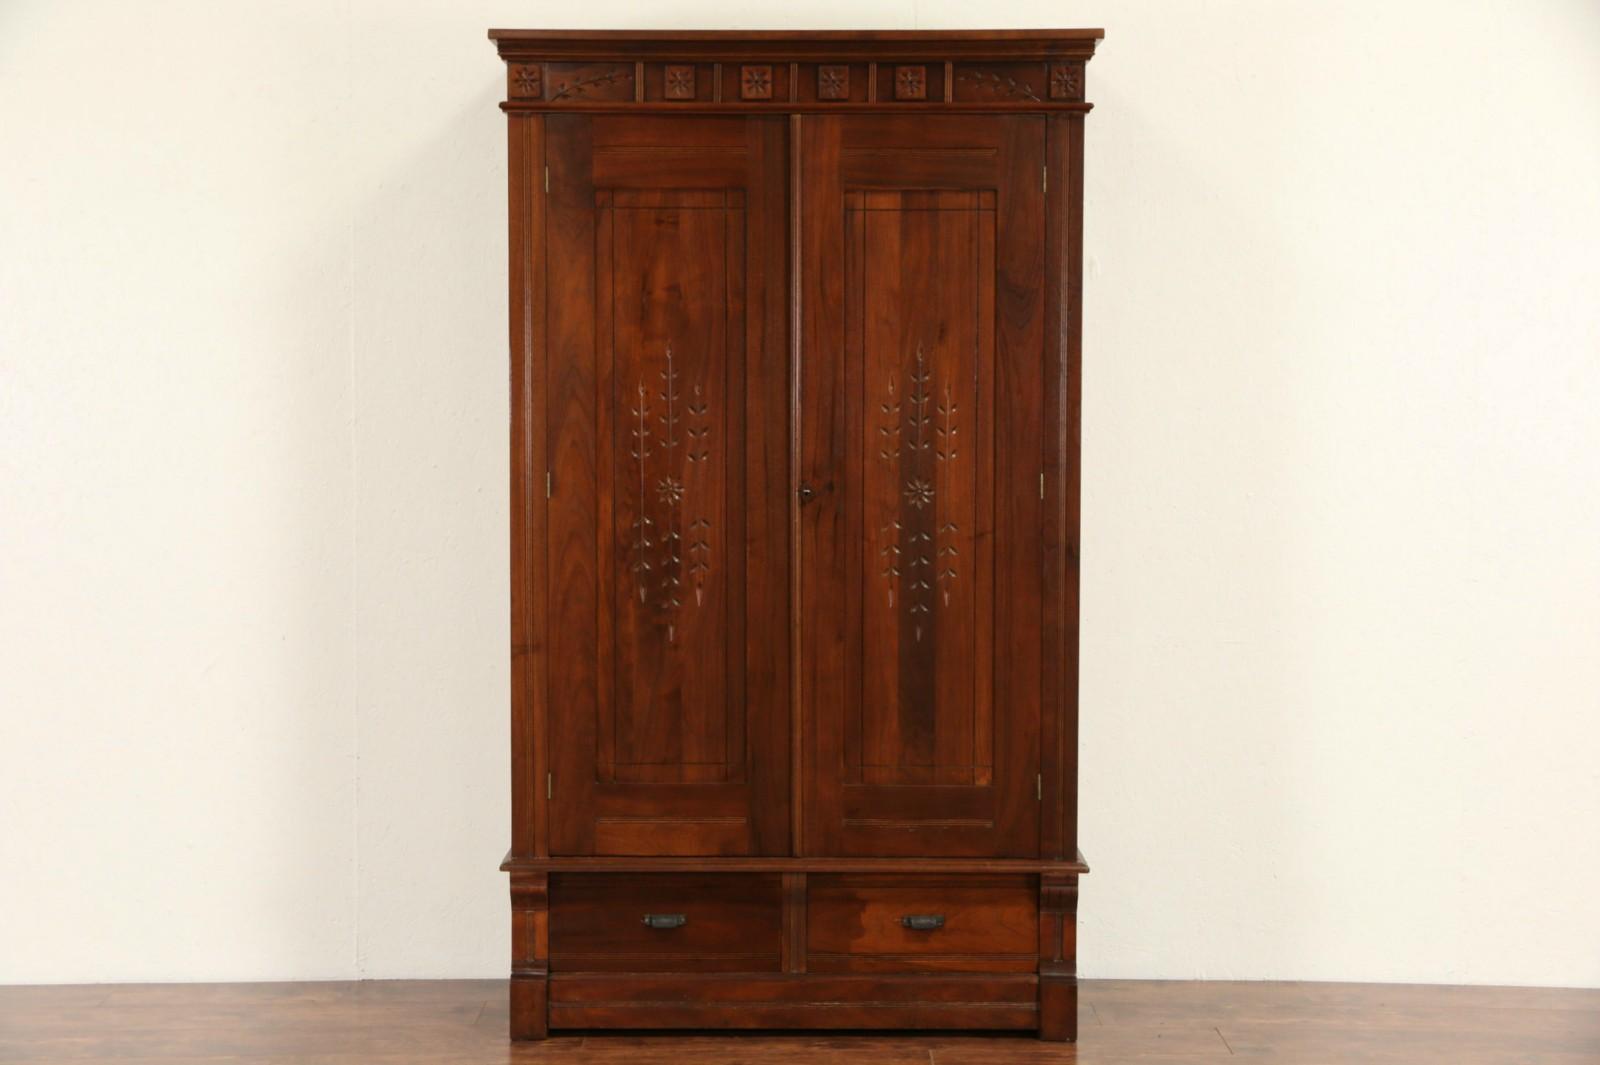 Merveilleux Victorian Eastlake 1880 Antique Walnut Armoire, Closet Or Wardrobe ...